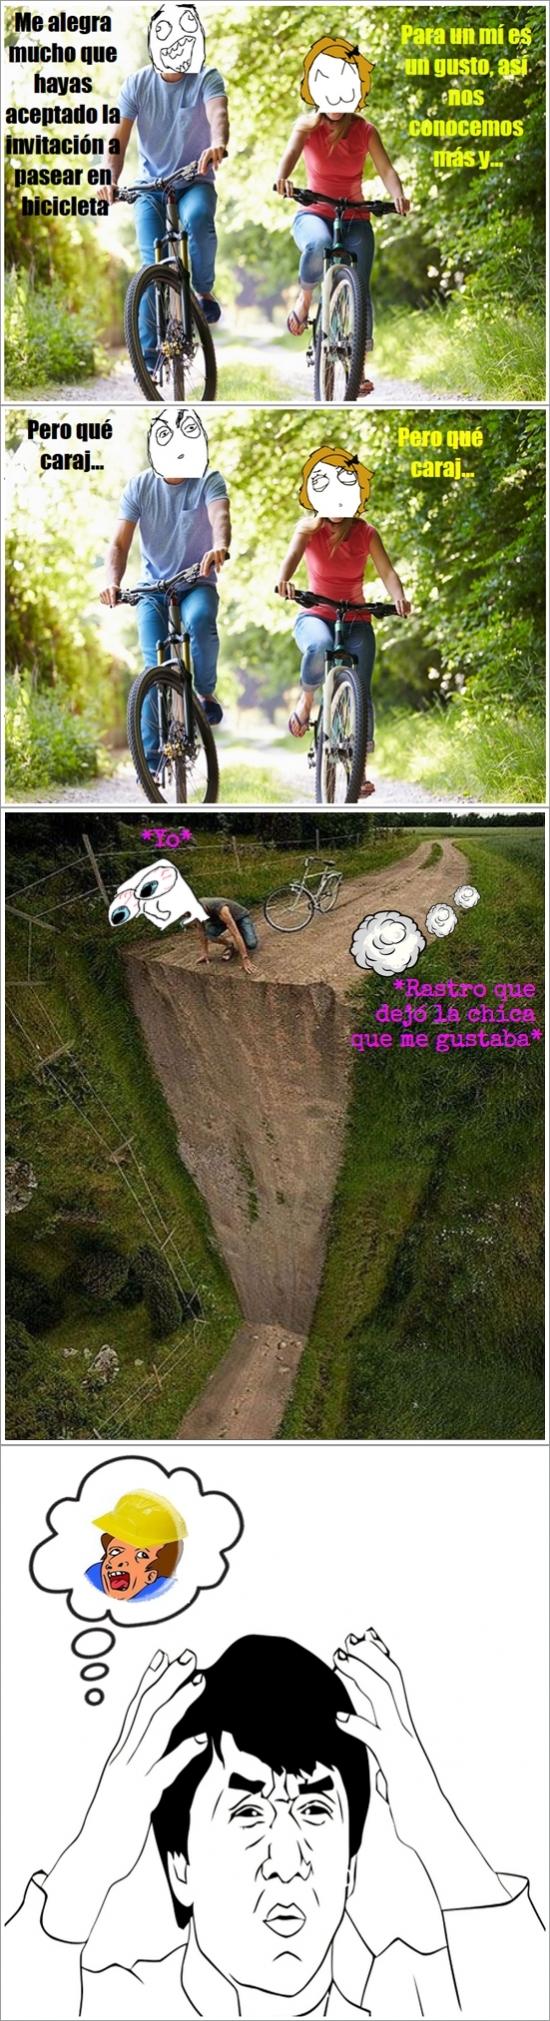 Jackie_chan - Ciclismo extremo, ¡realmente extremo!